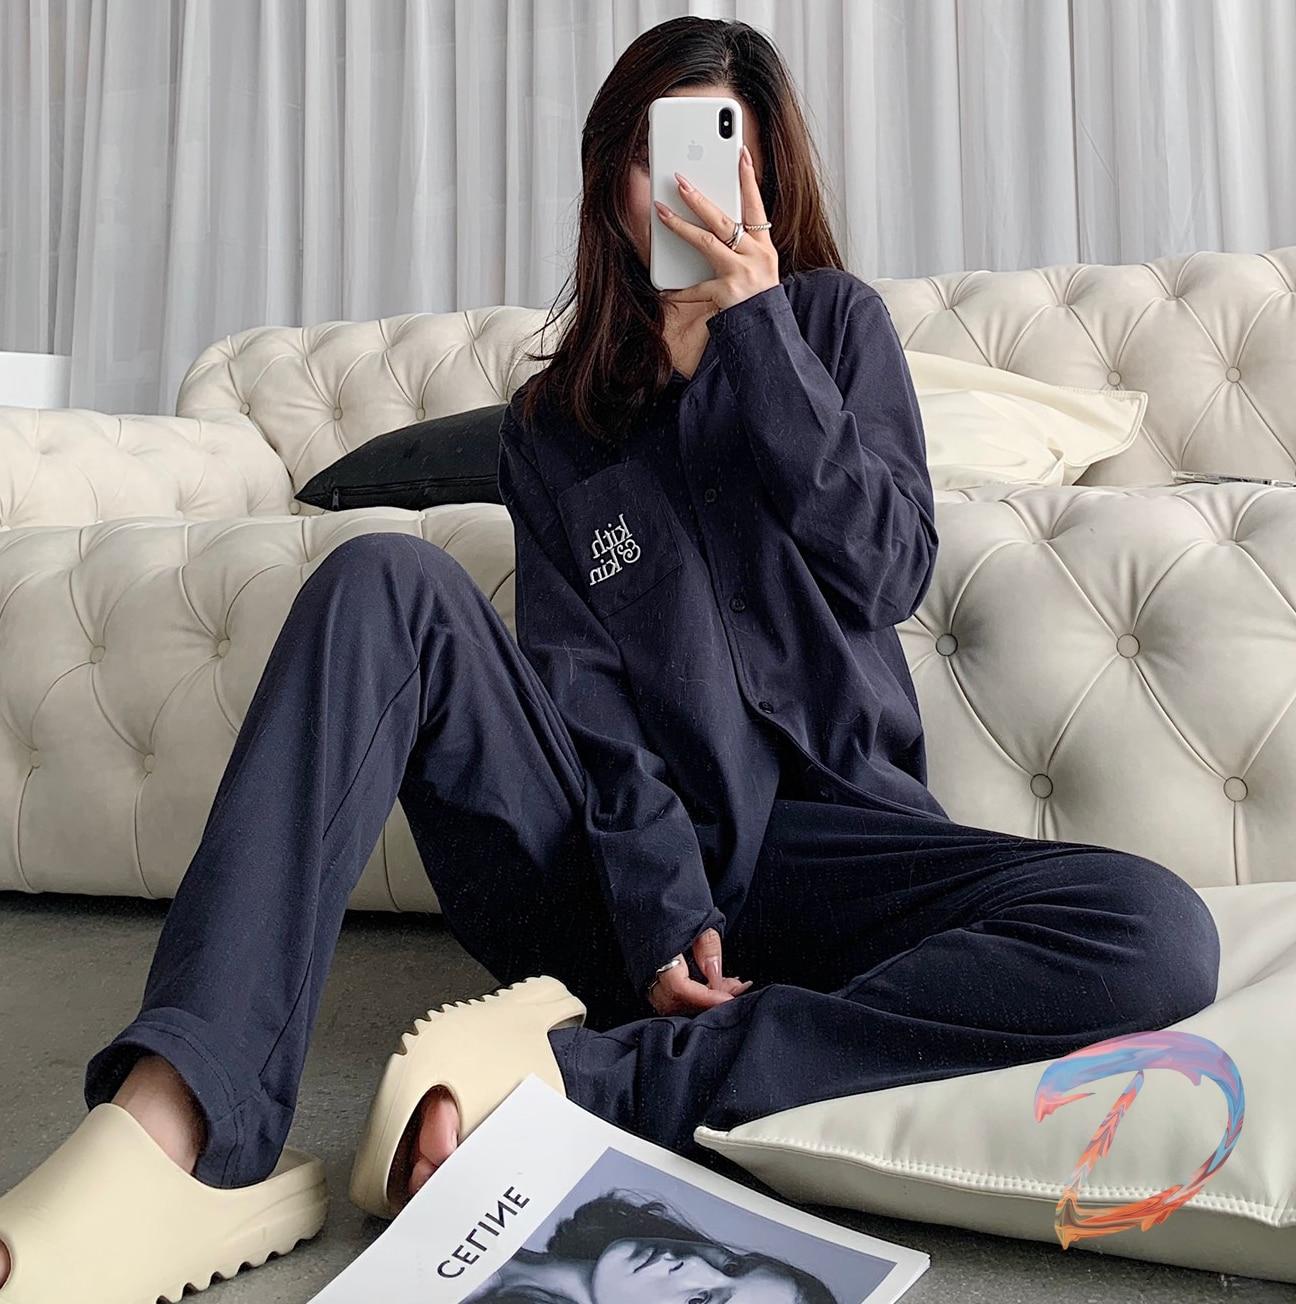 Kith Gift Box Pajamas Set High Quality Cotton Loose Casual Pajamas Men's Women's Kith Fashion Couples Limited Pajama Set